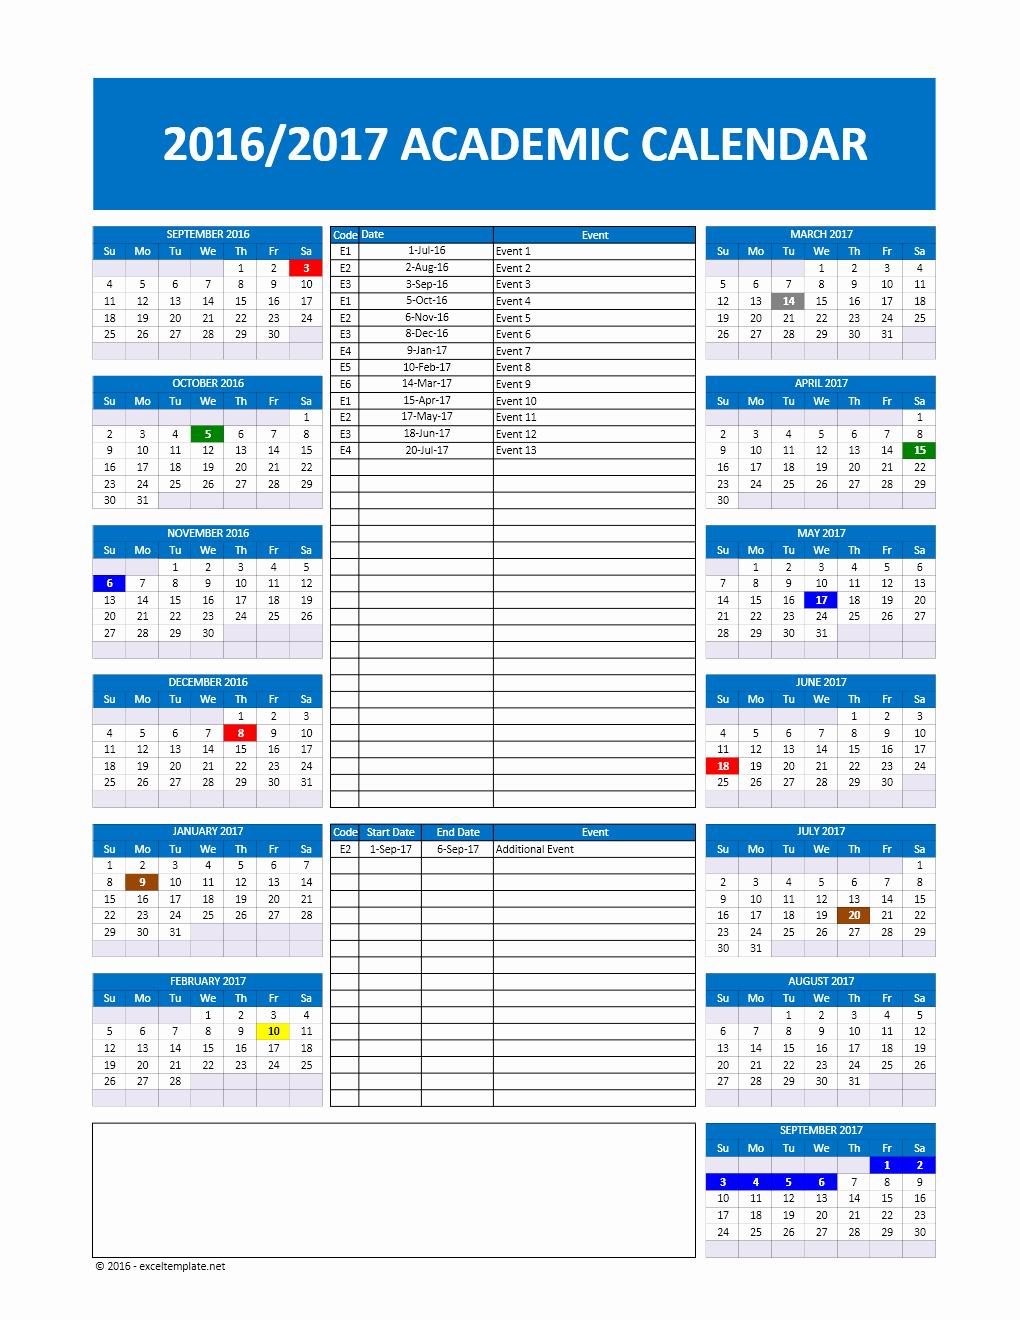 Excel Calendar Schedule Template Unique 2017 2018 and 2016 2017 School Calendar Templates